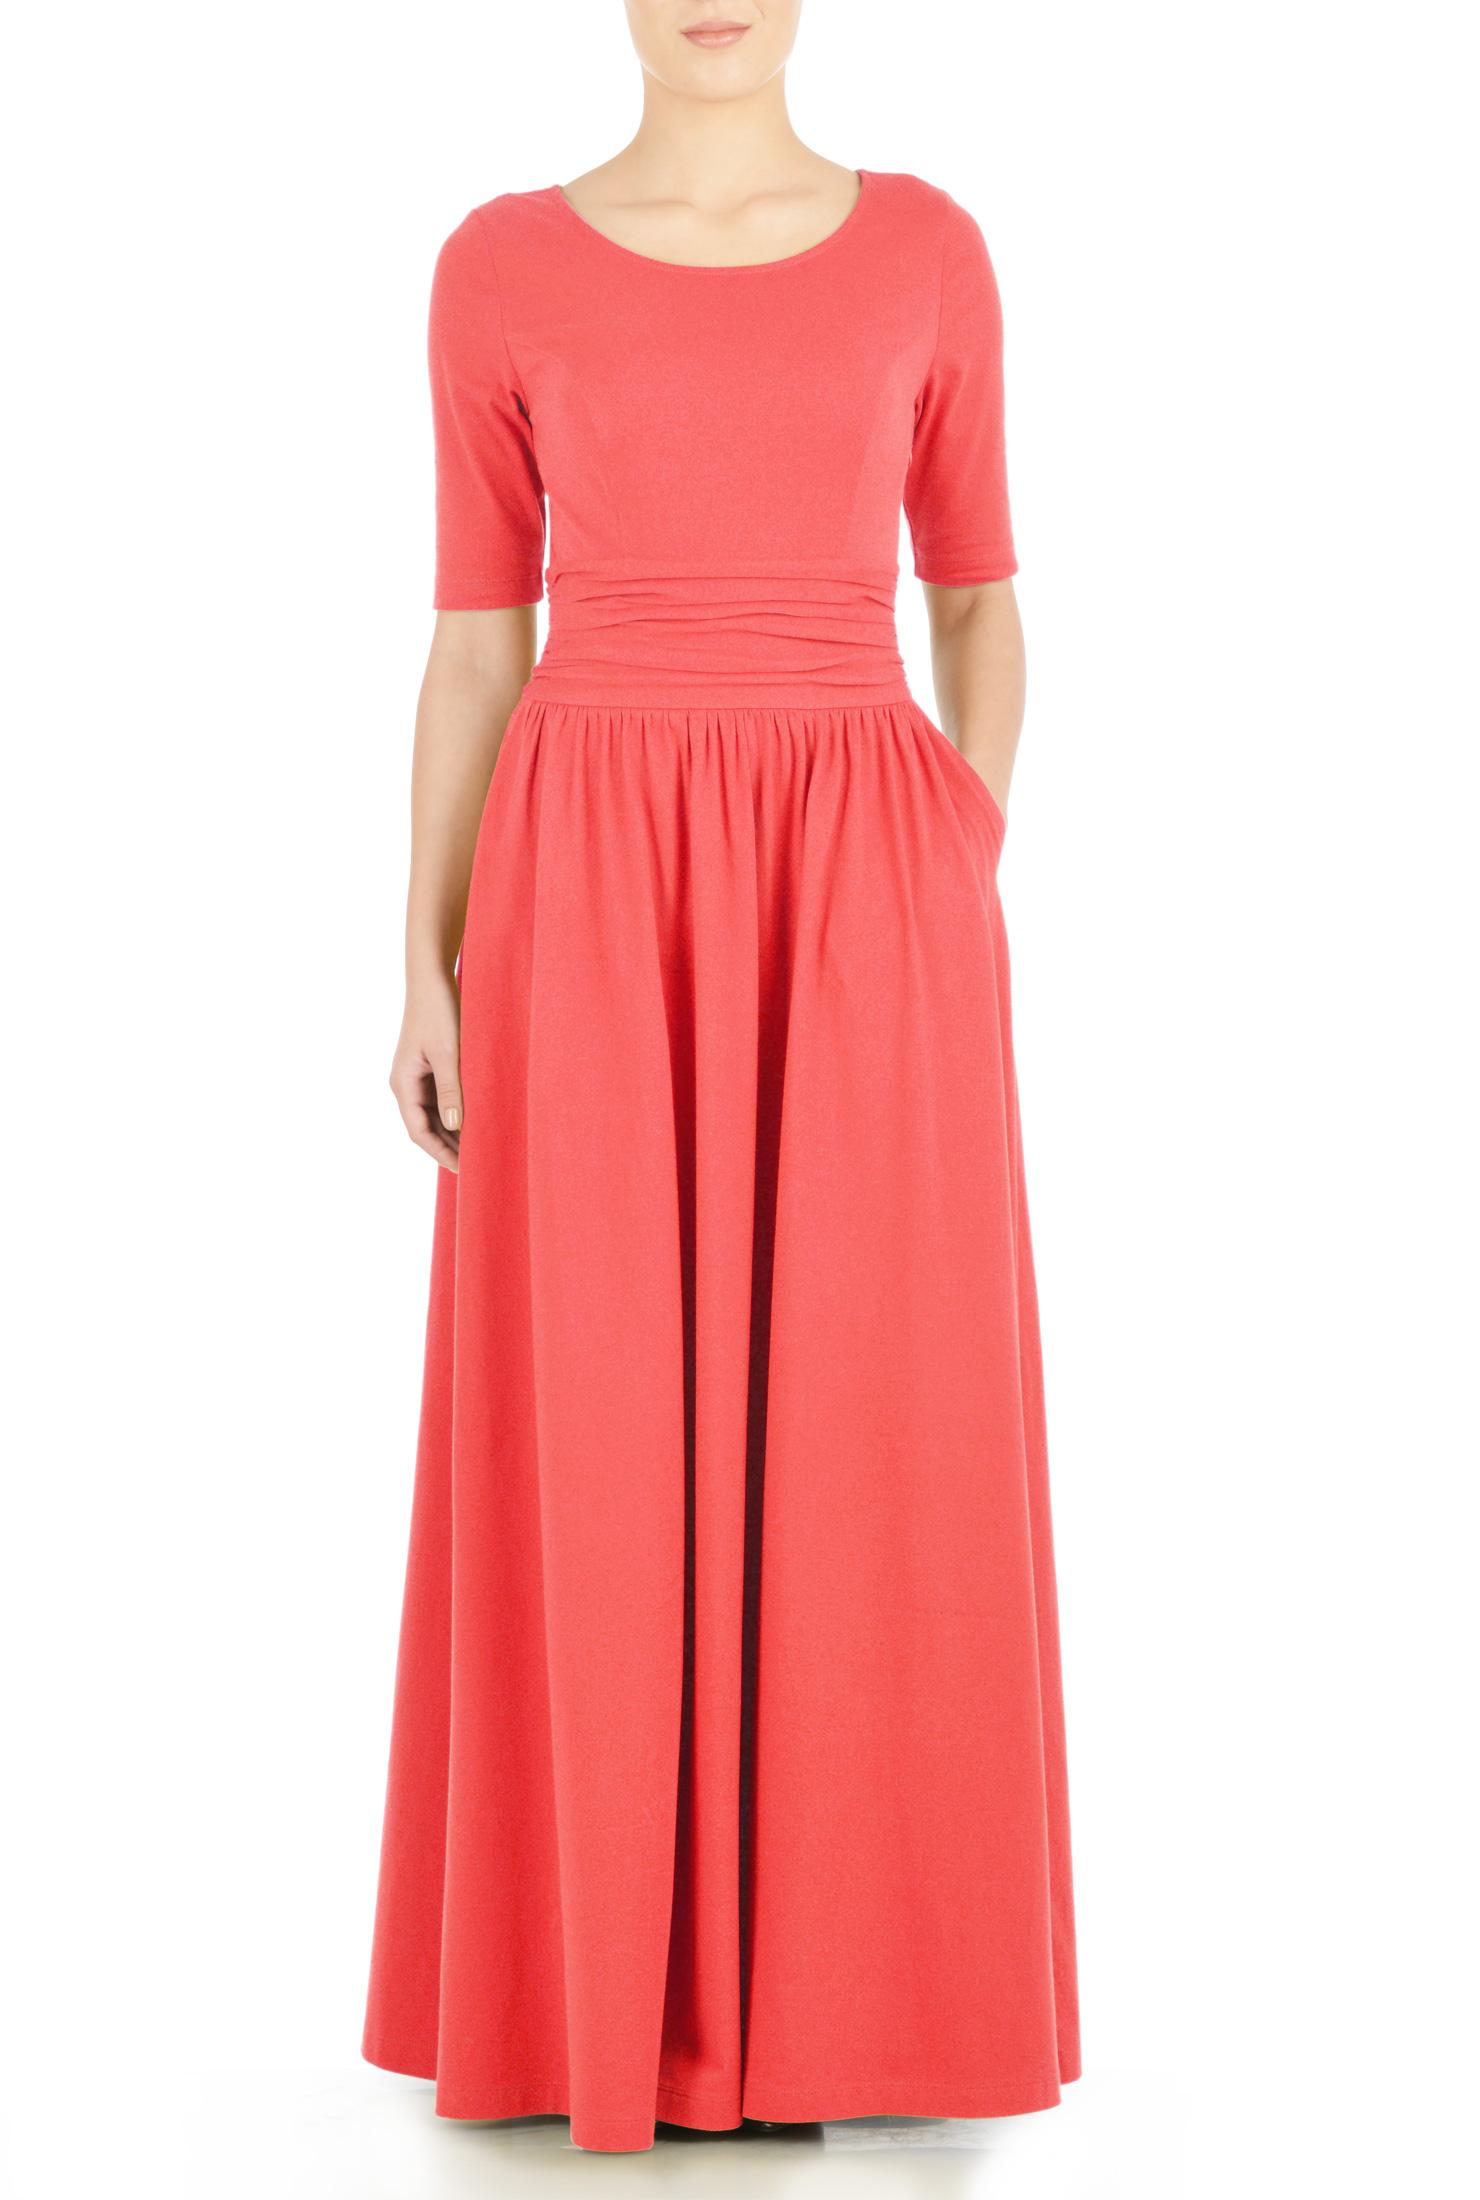 Women S Fashion Clothing 0 36w And Custom